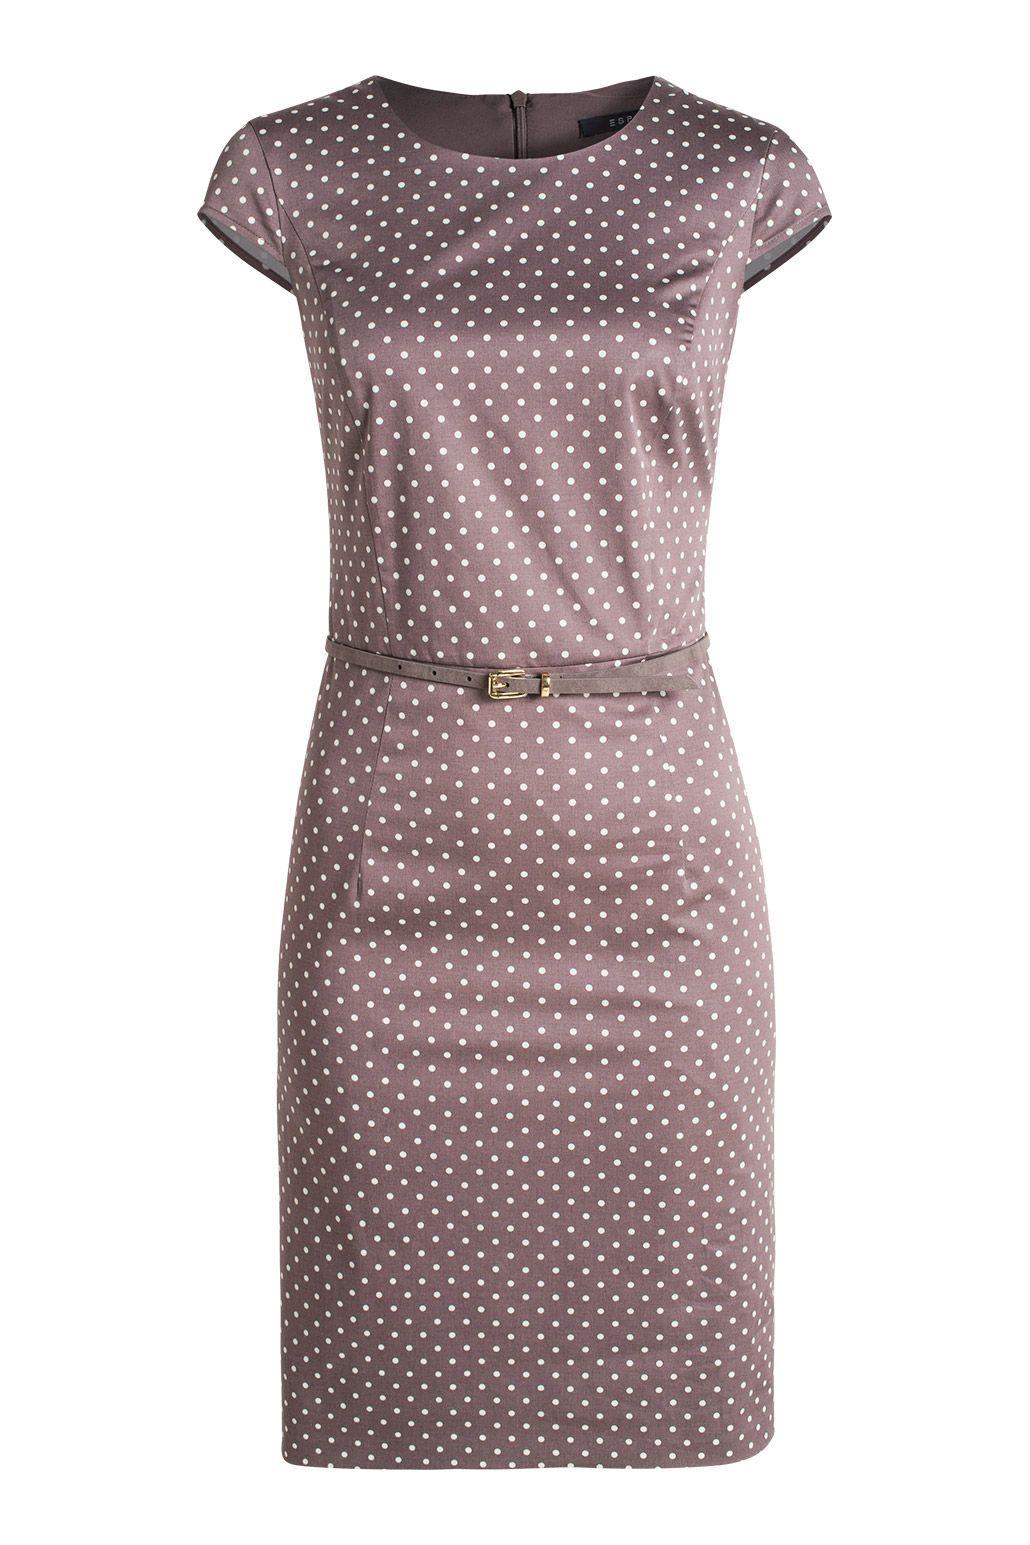 polka dots etuikleid mit gürtel | kleider, etuikleid